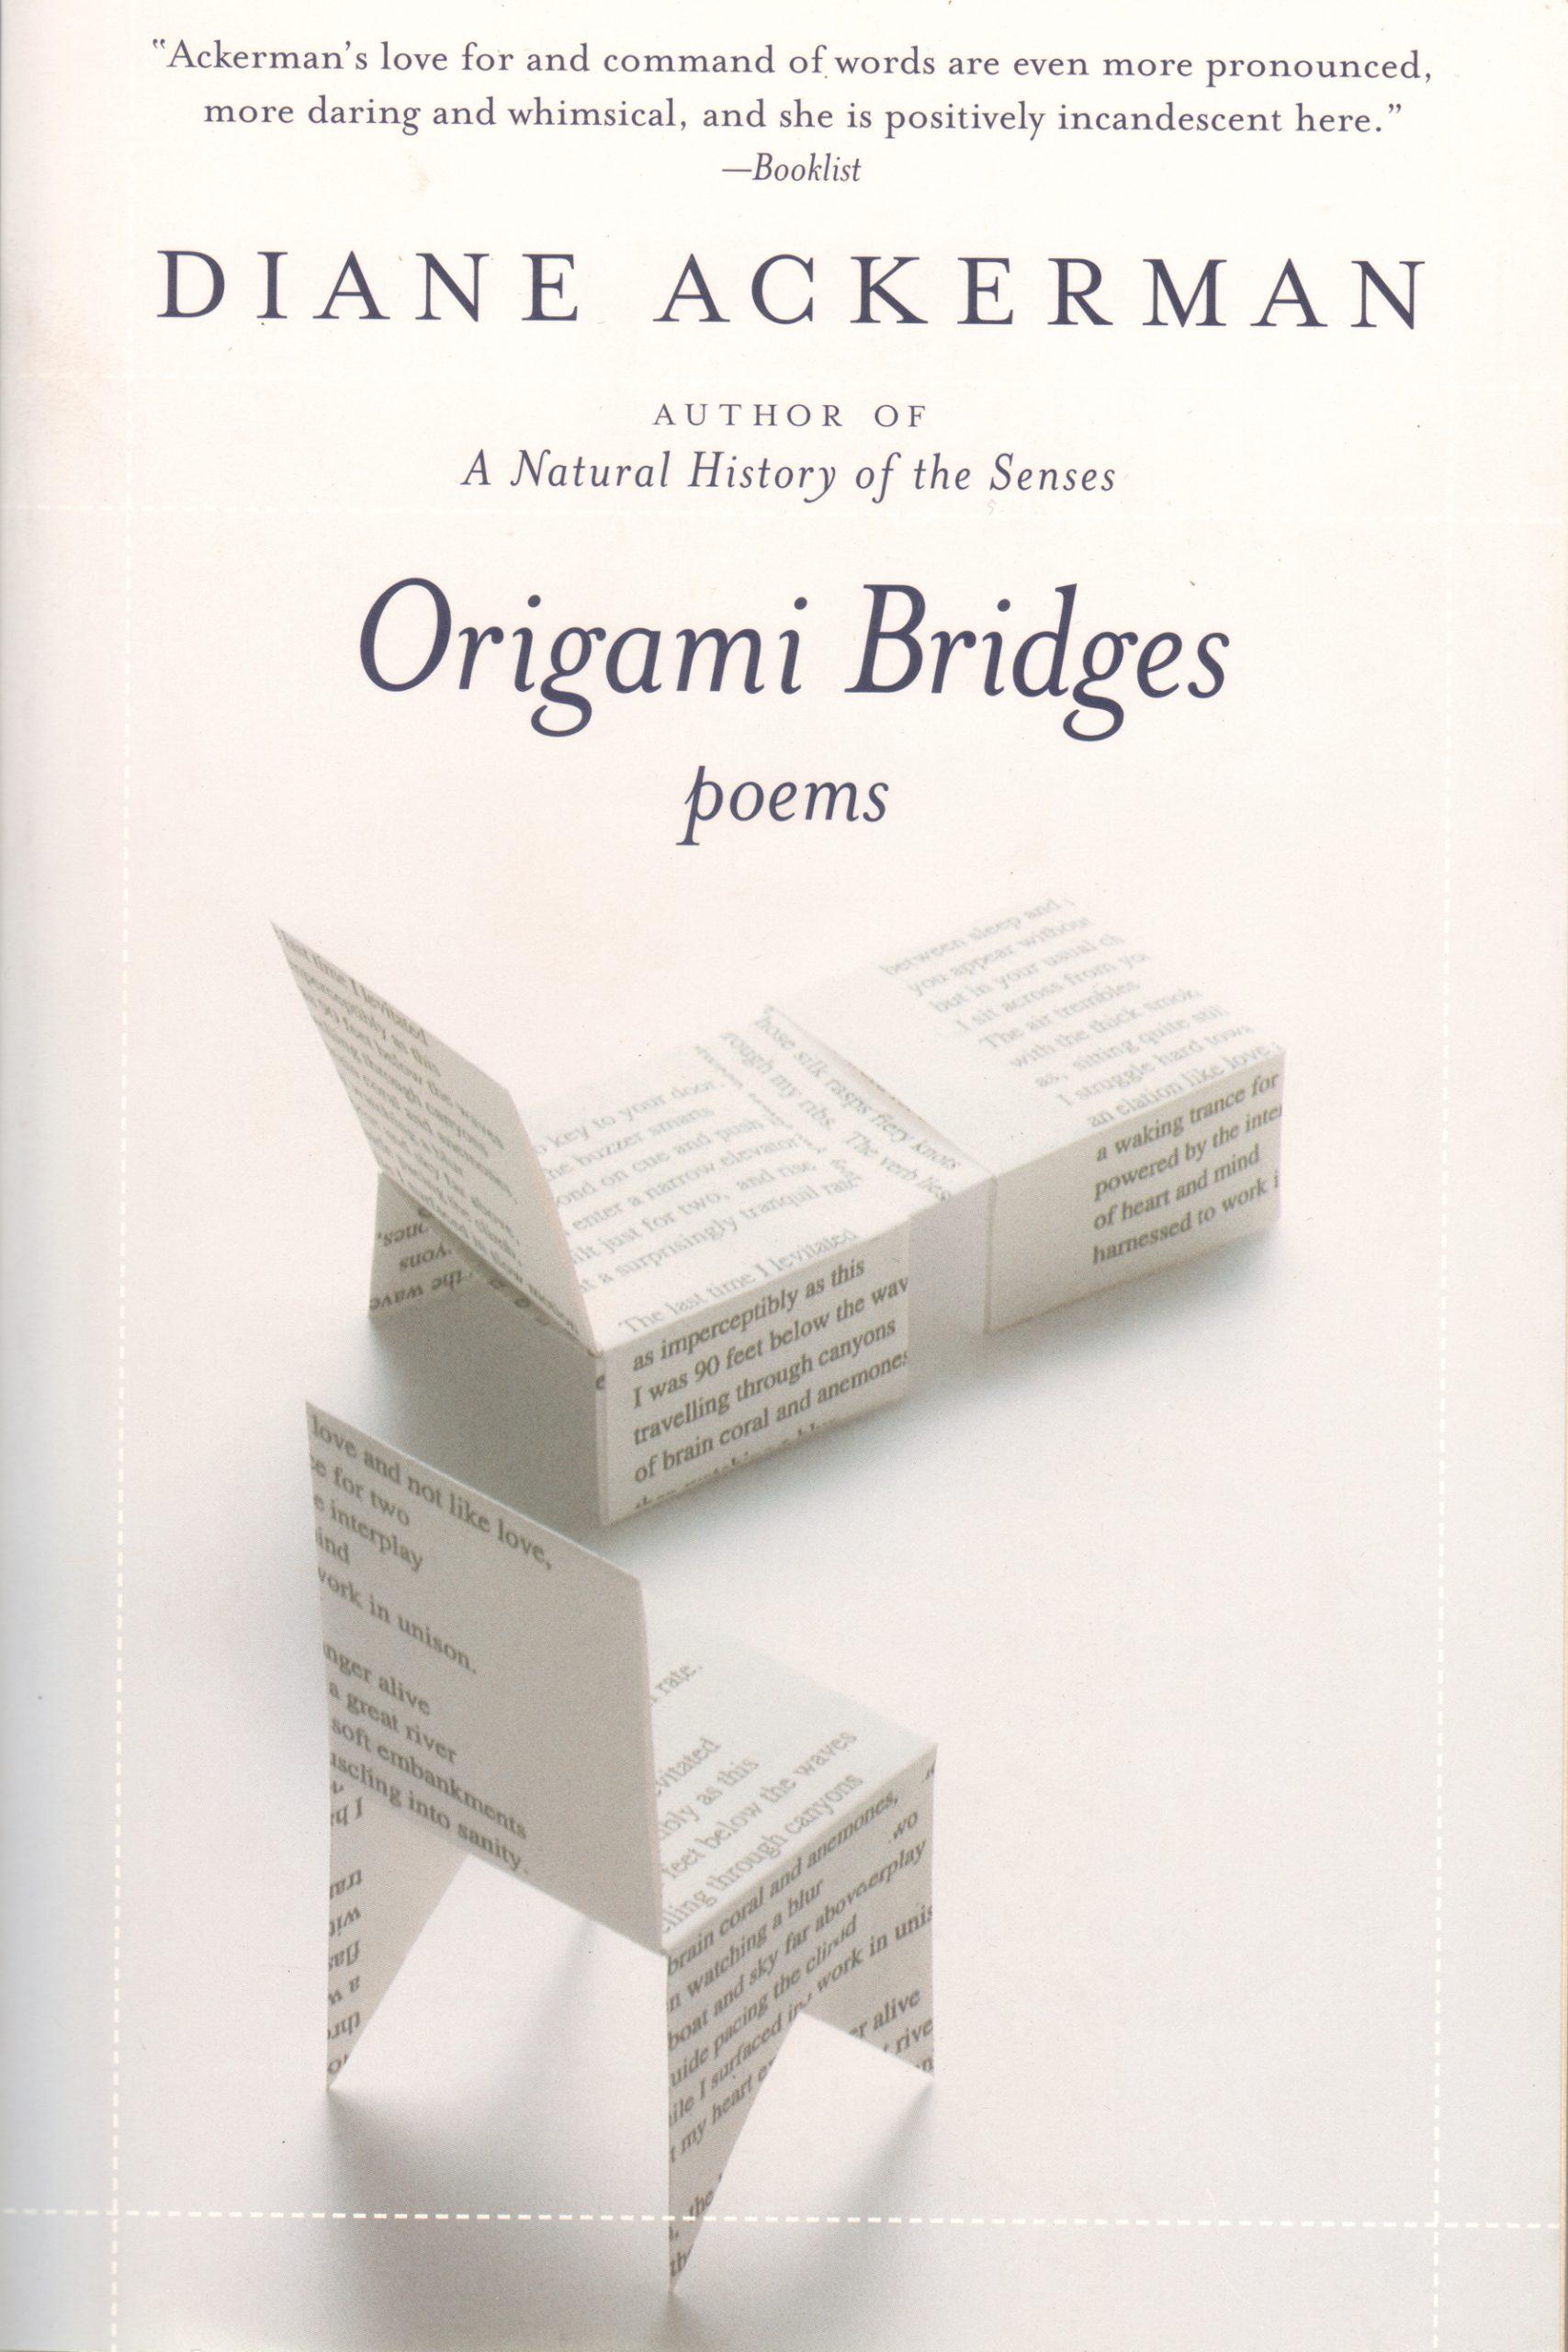 Origami Bridges by Diane Ackerman